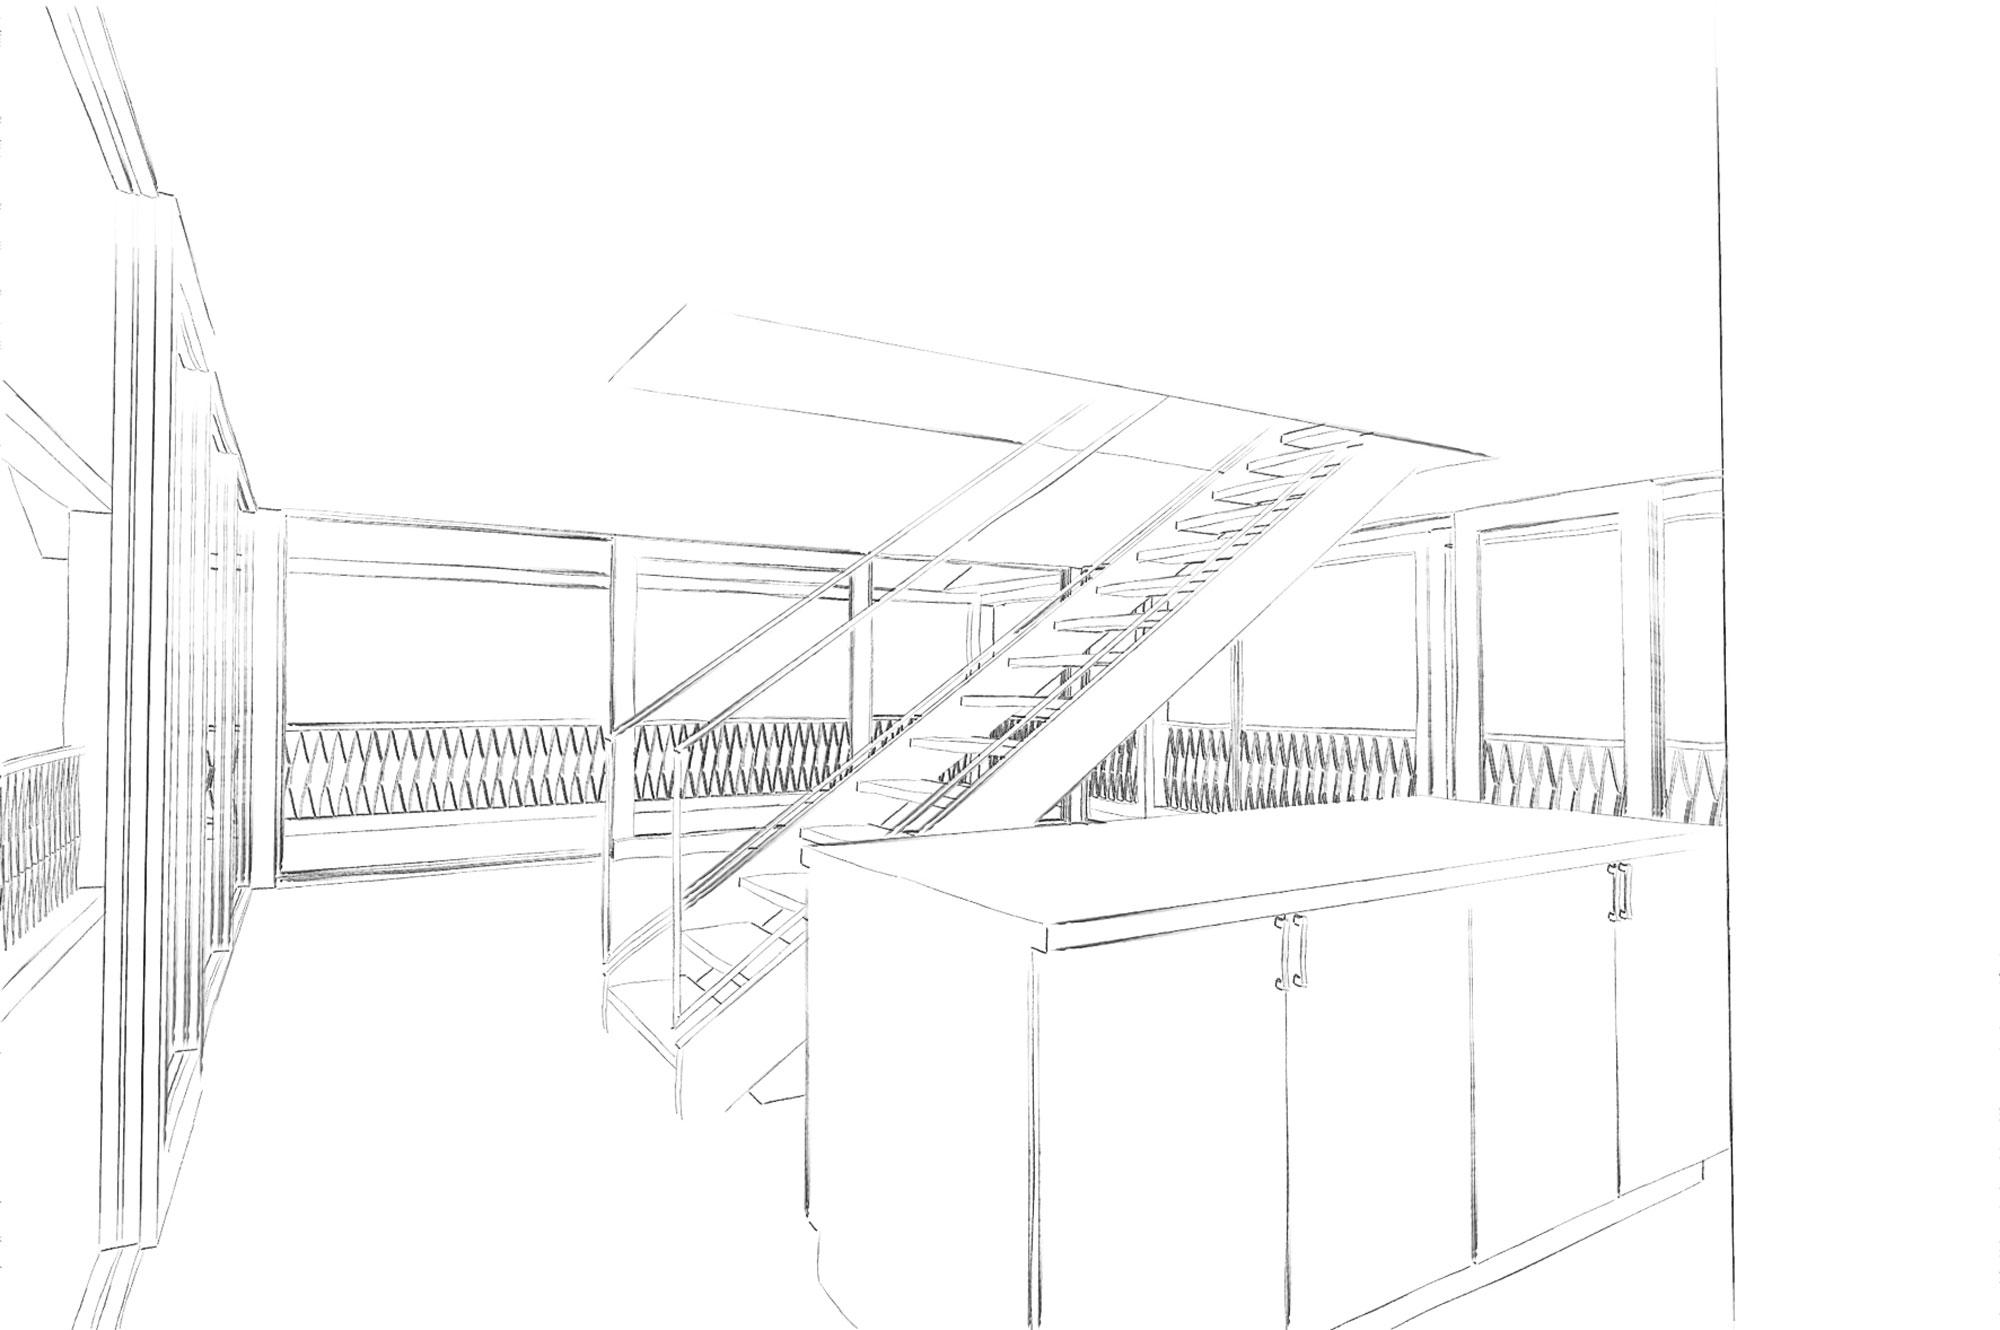 MAA_Murer_Andre_Architektur_Ersatzneubau_Buochs_005.jpg